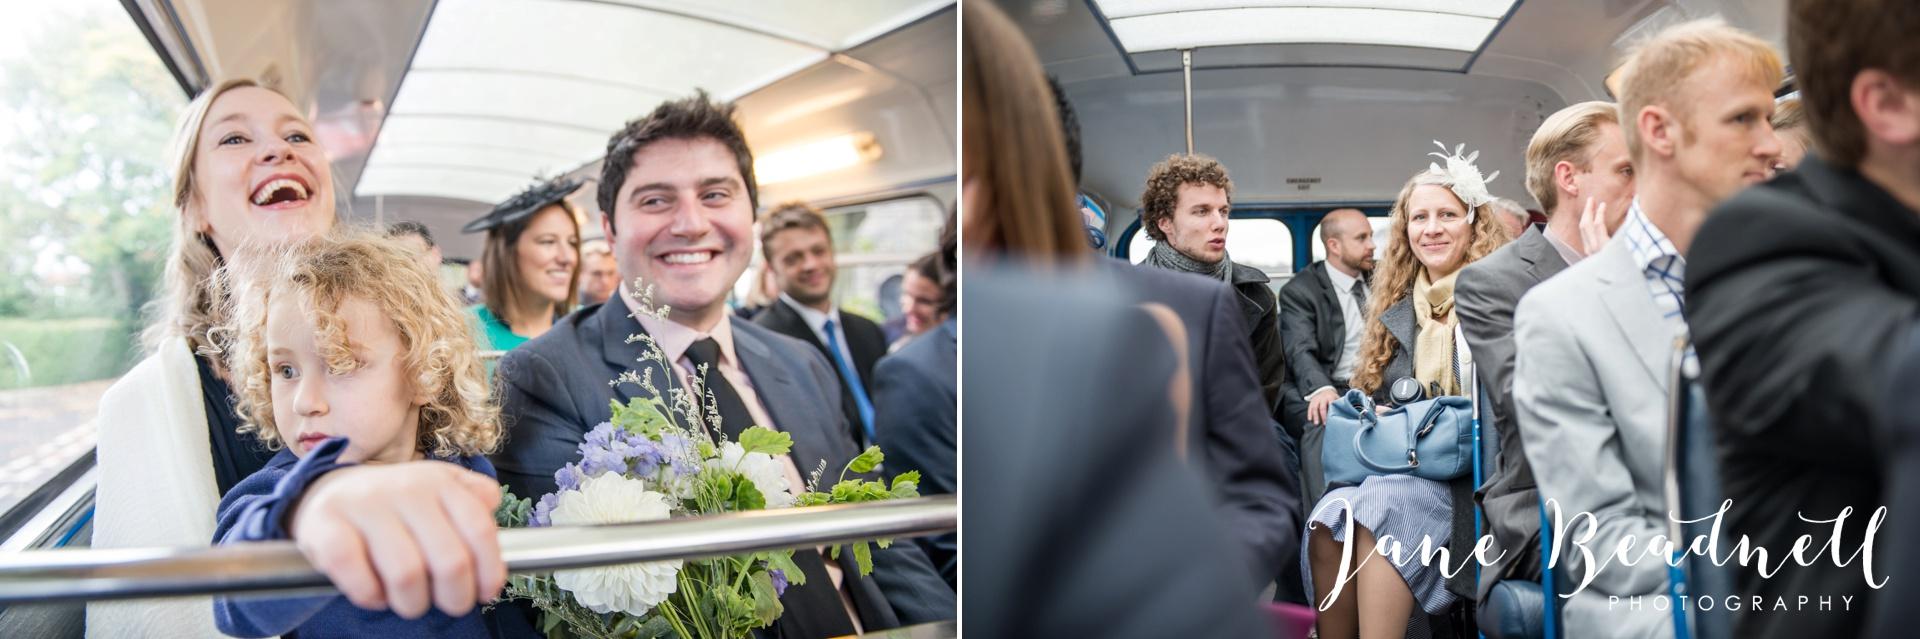 The Tetley Leeds Wedding Photography by Jane Beadnell_0057